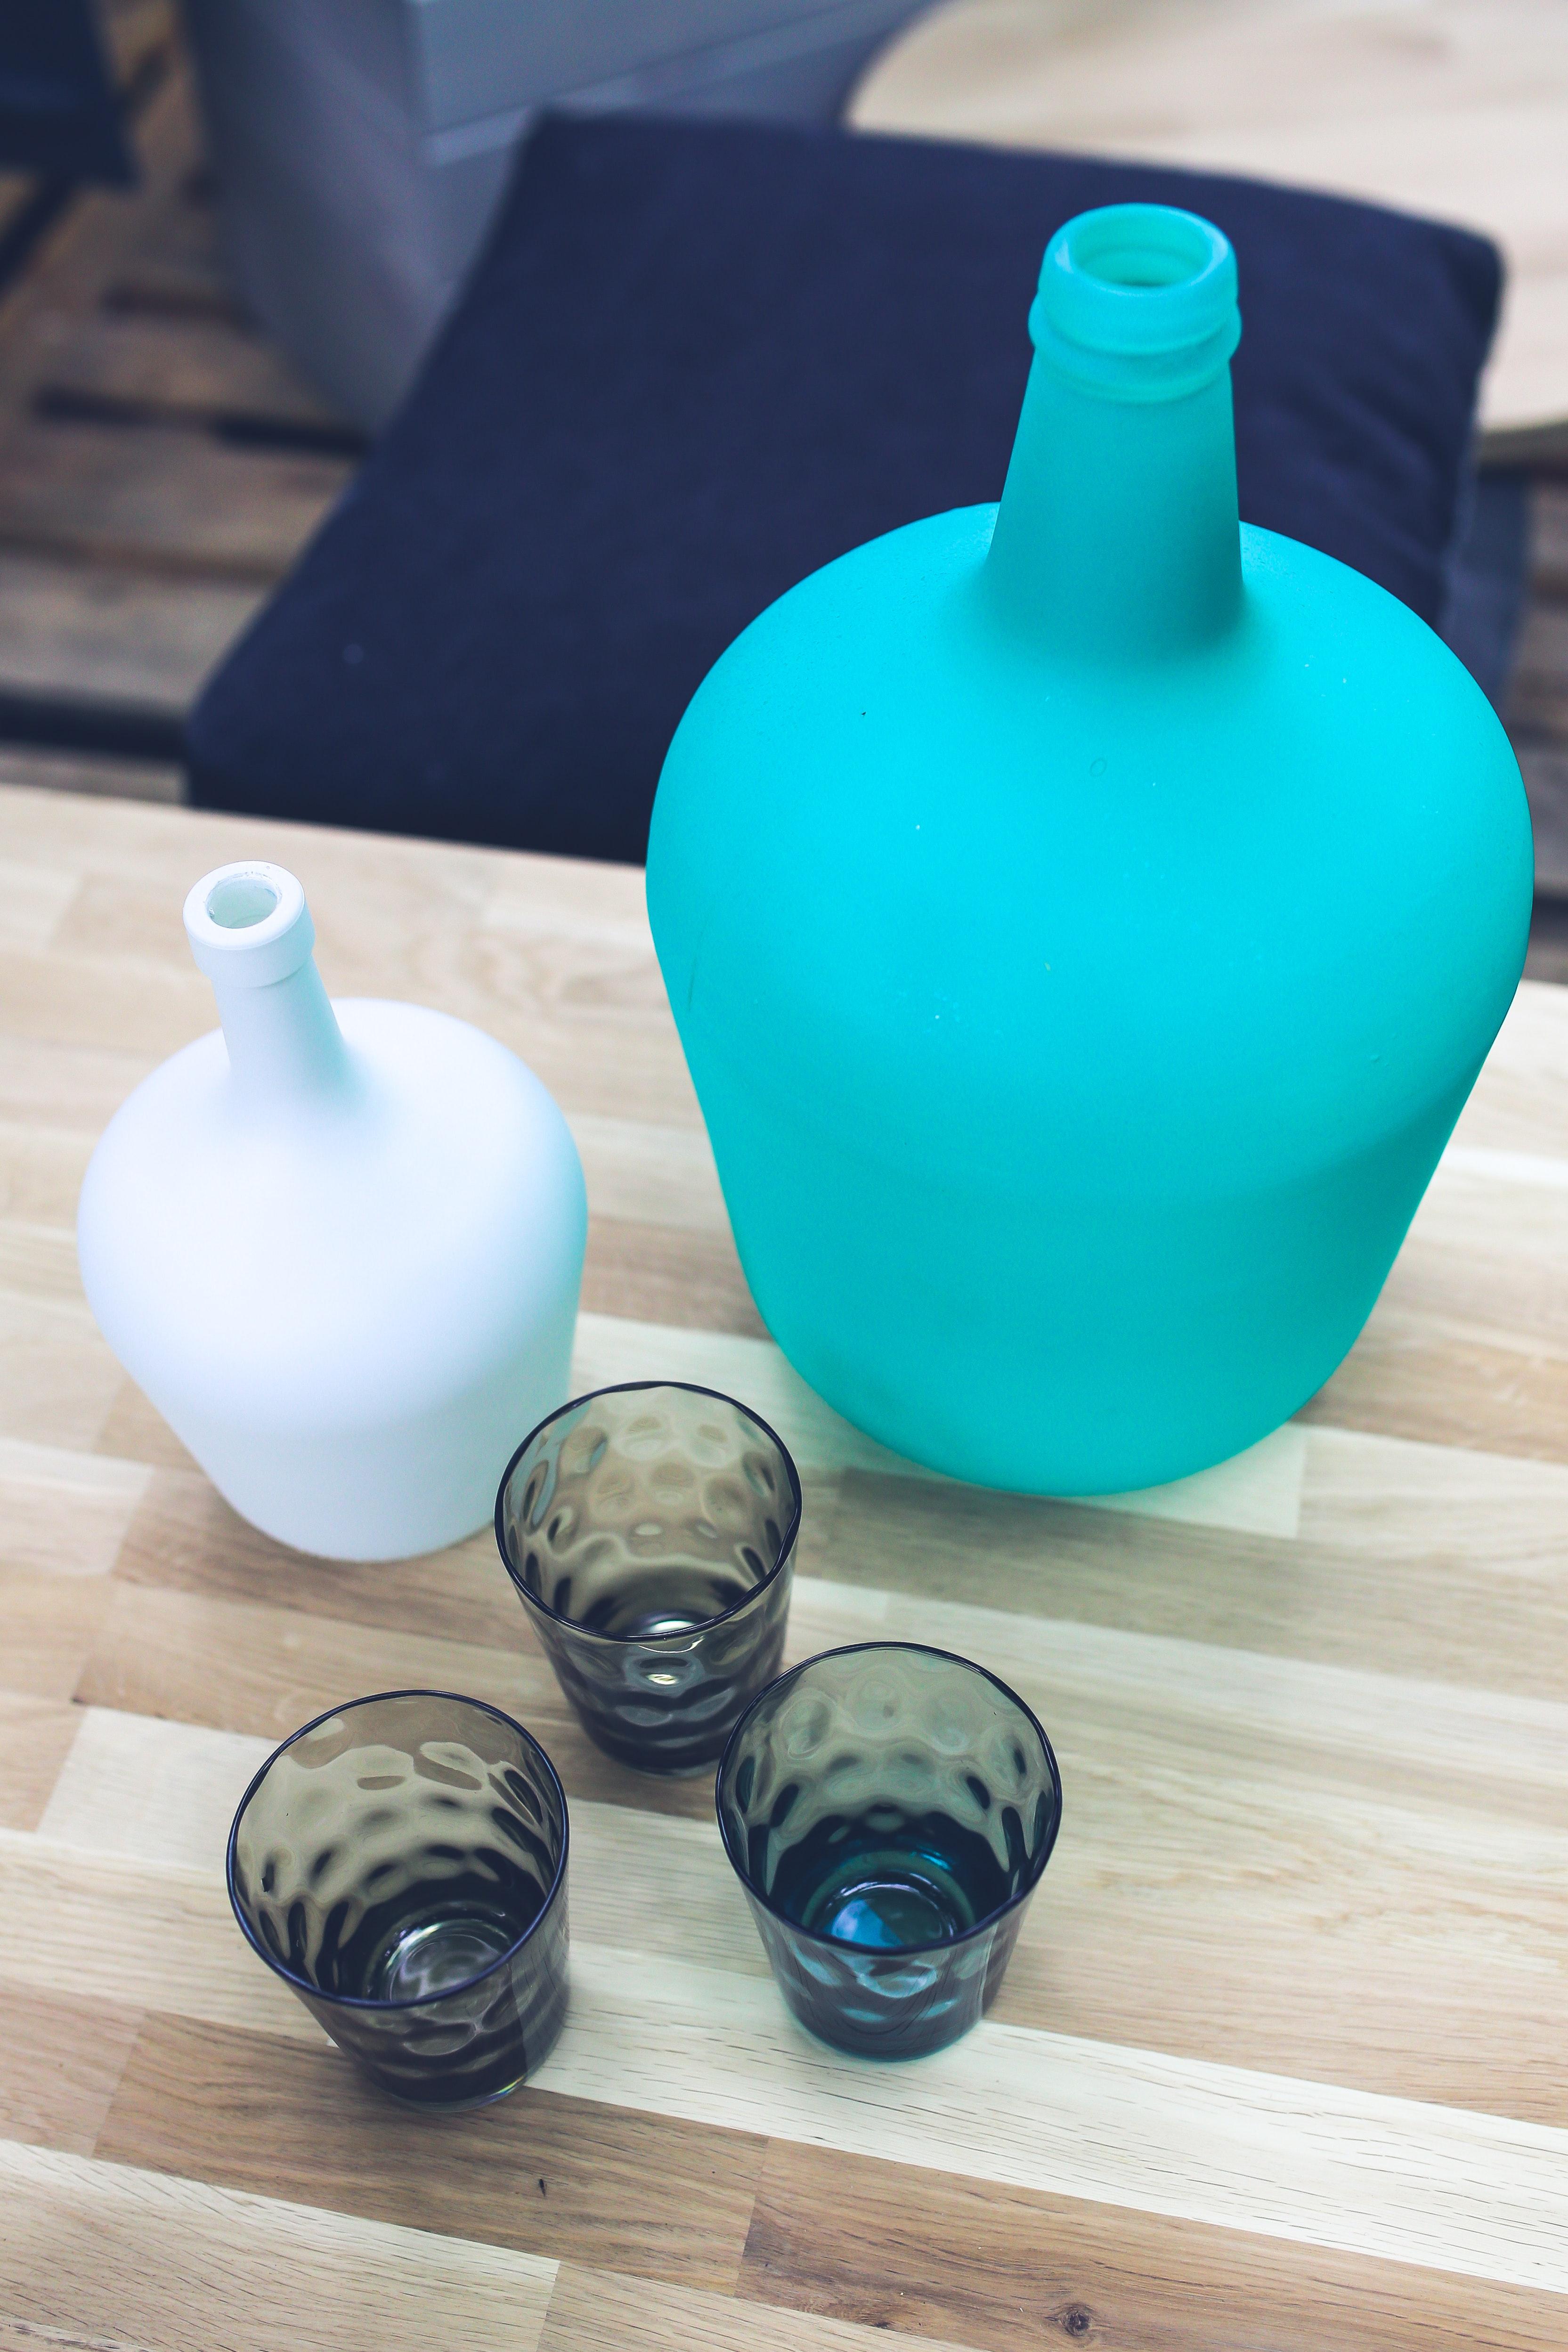 Bottle & glasses, Applied art, Group, Wood, White, HQ Photo